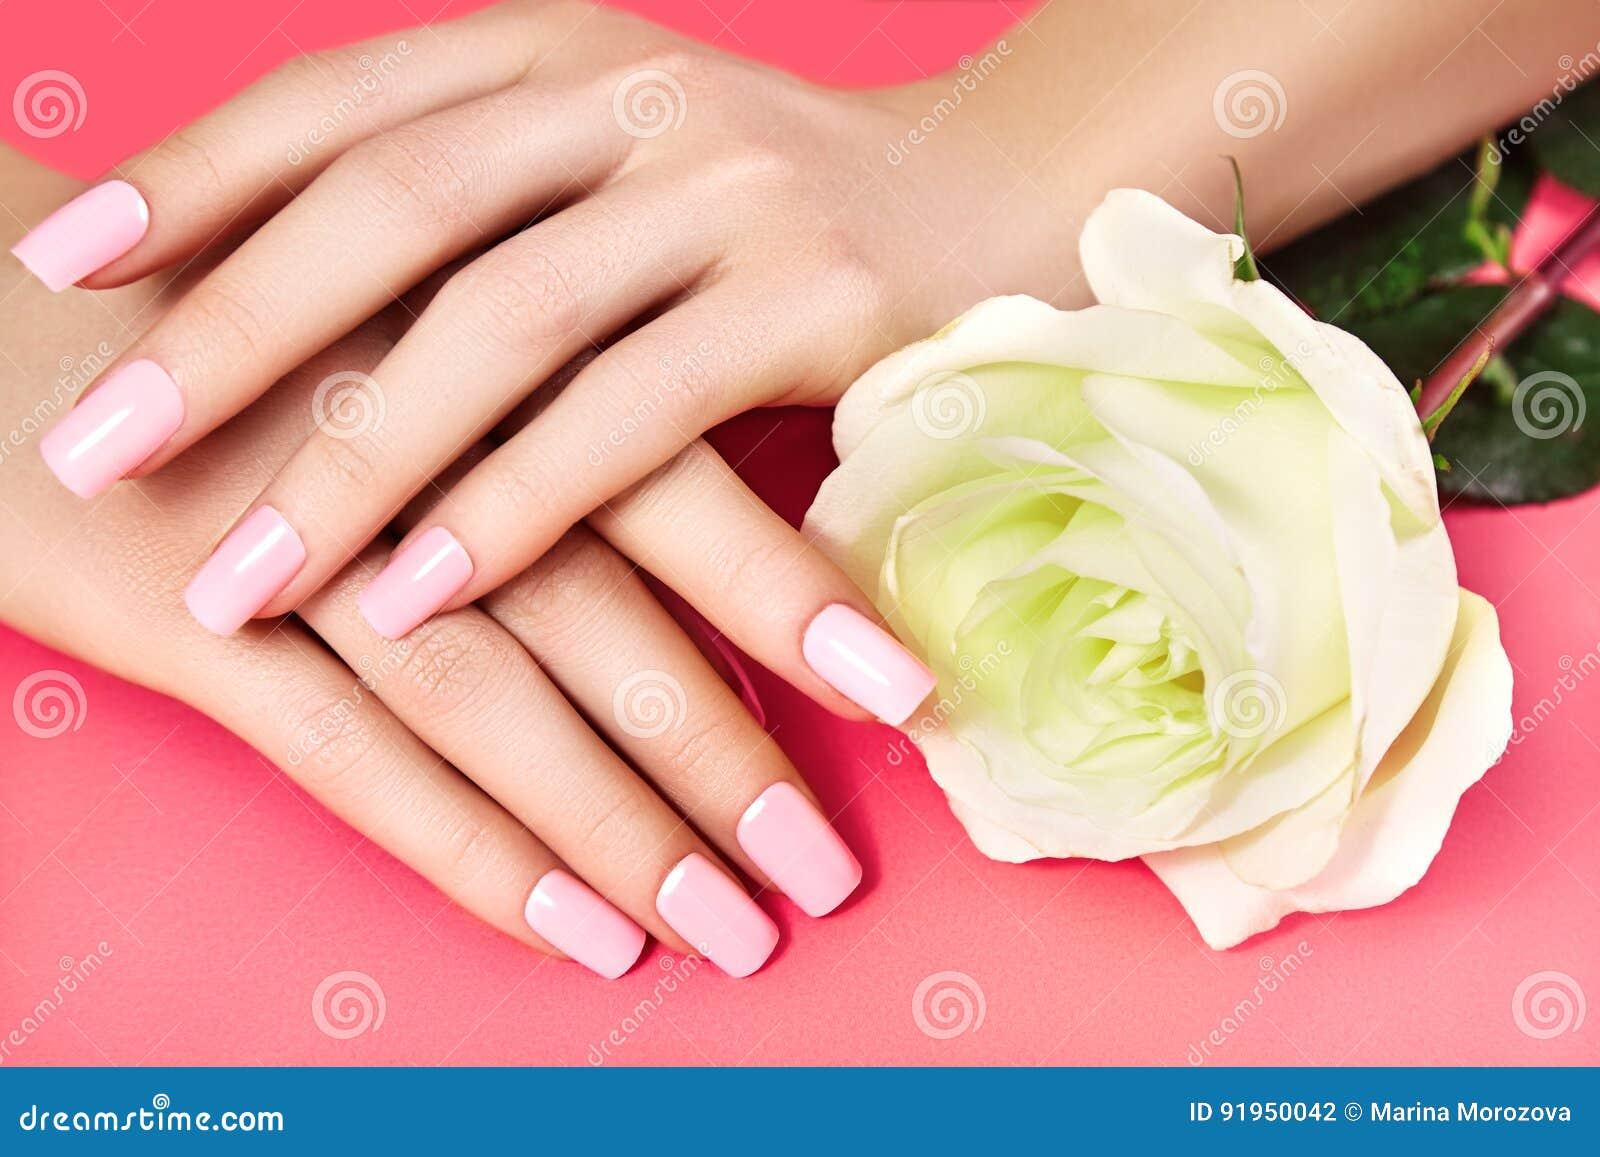 Manikürte Nägel mit rosa Nagellack Maniküre mit nailpolish Modekunstmaniküre, glänzender Gellack Nagelt Salon